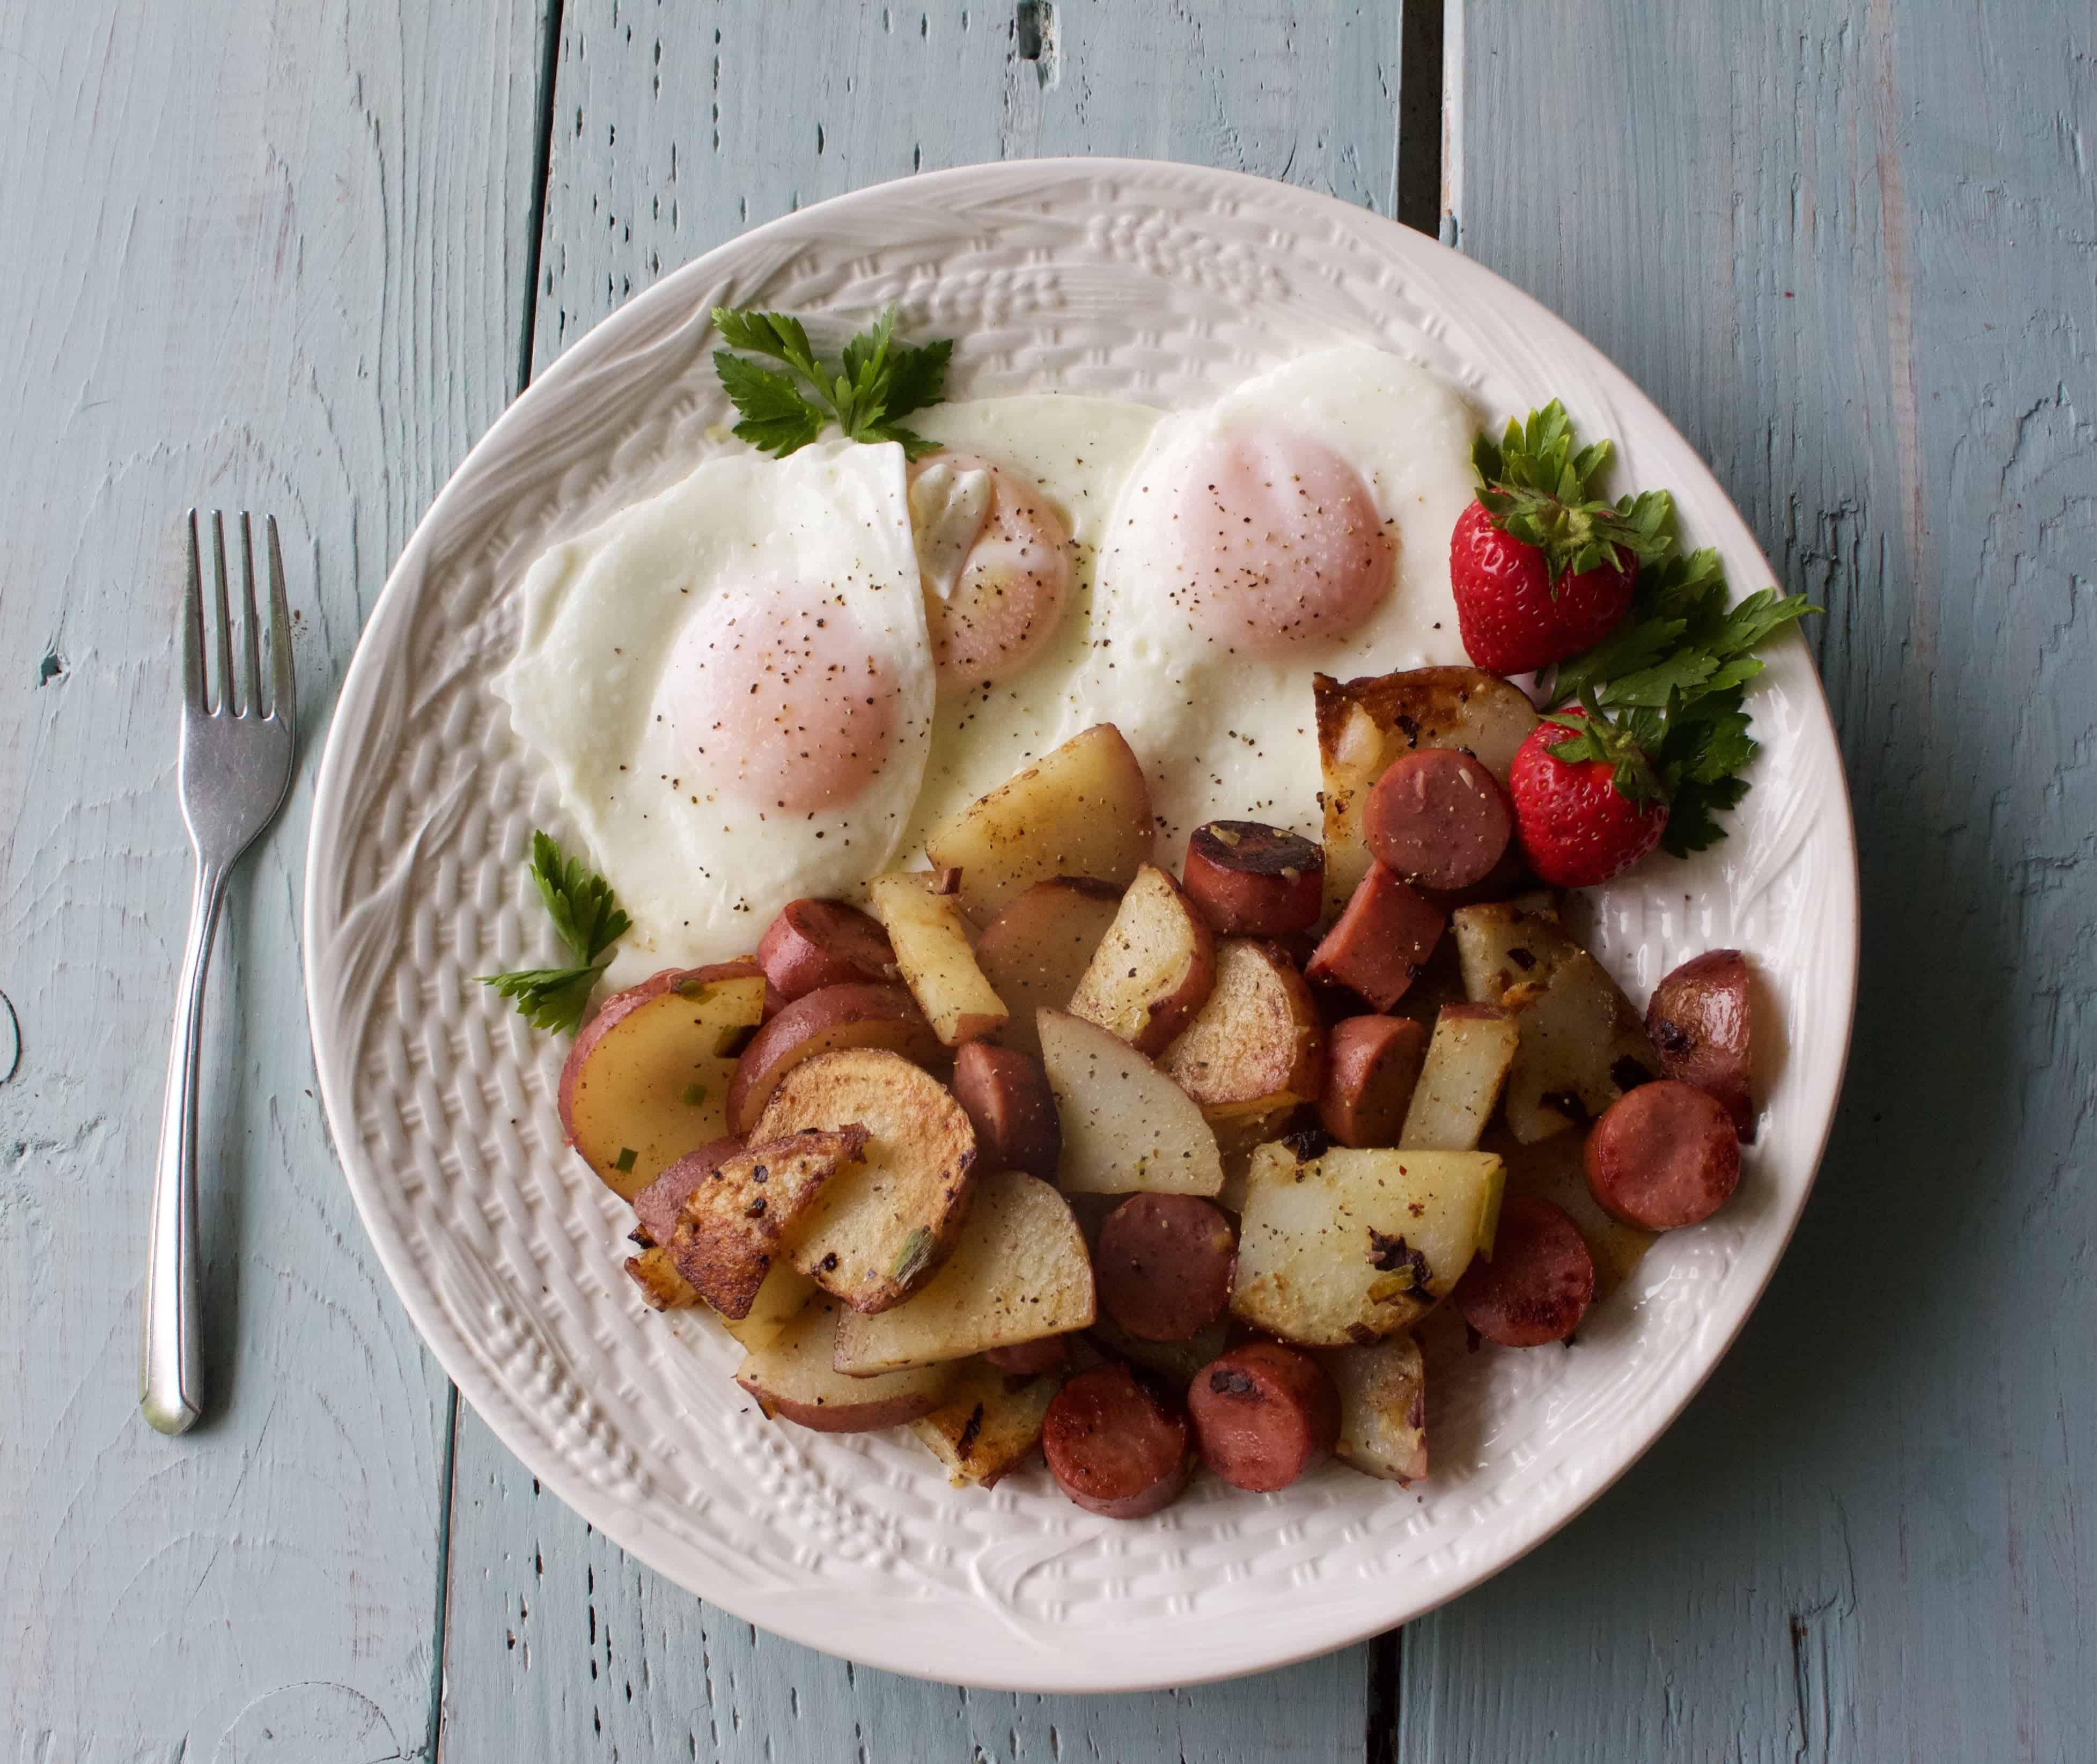 Fried Potatoes and Eggs | Homemade Food Junkie